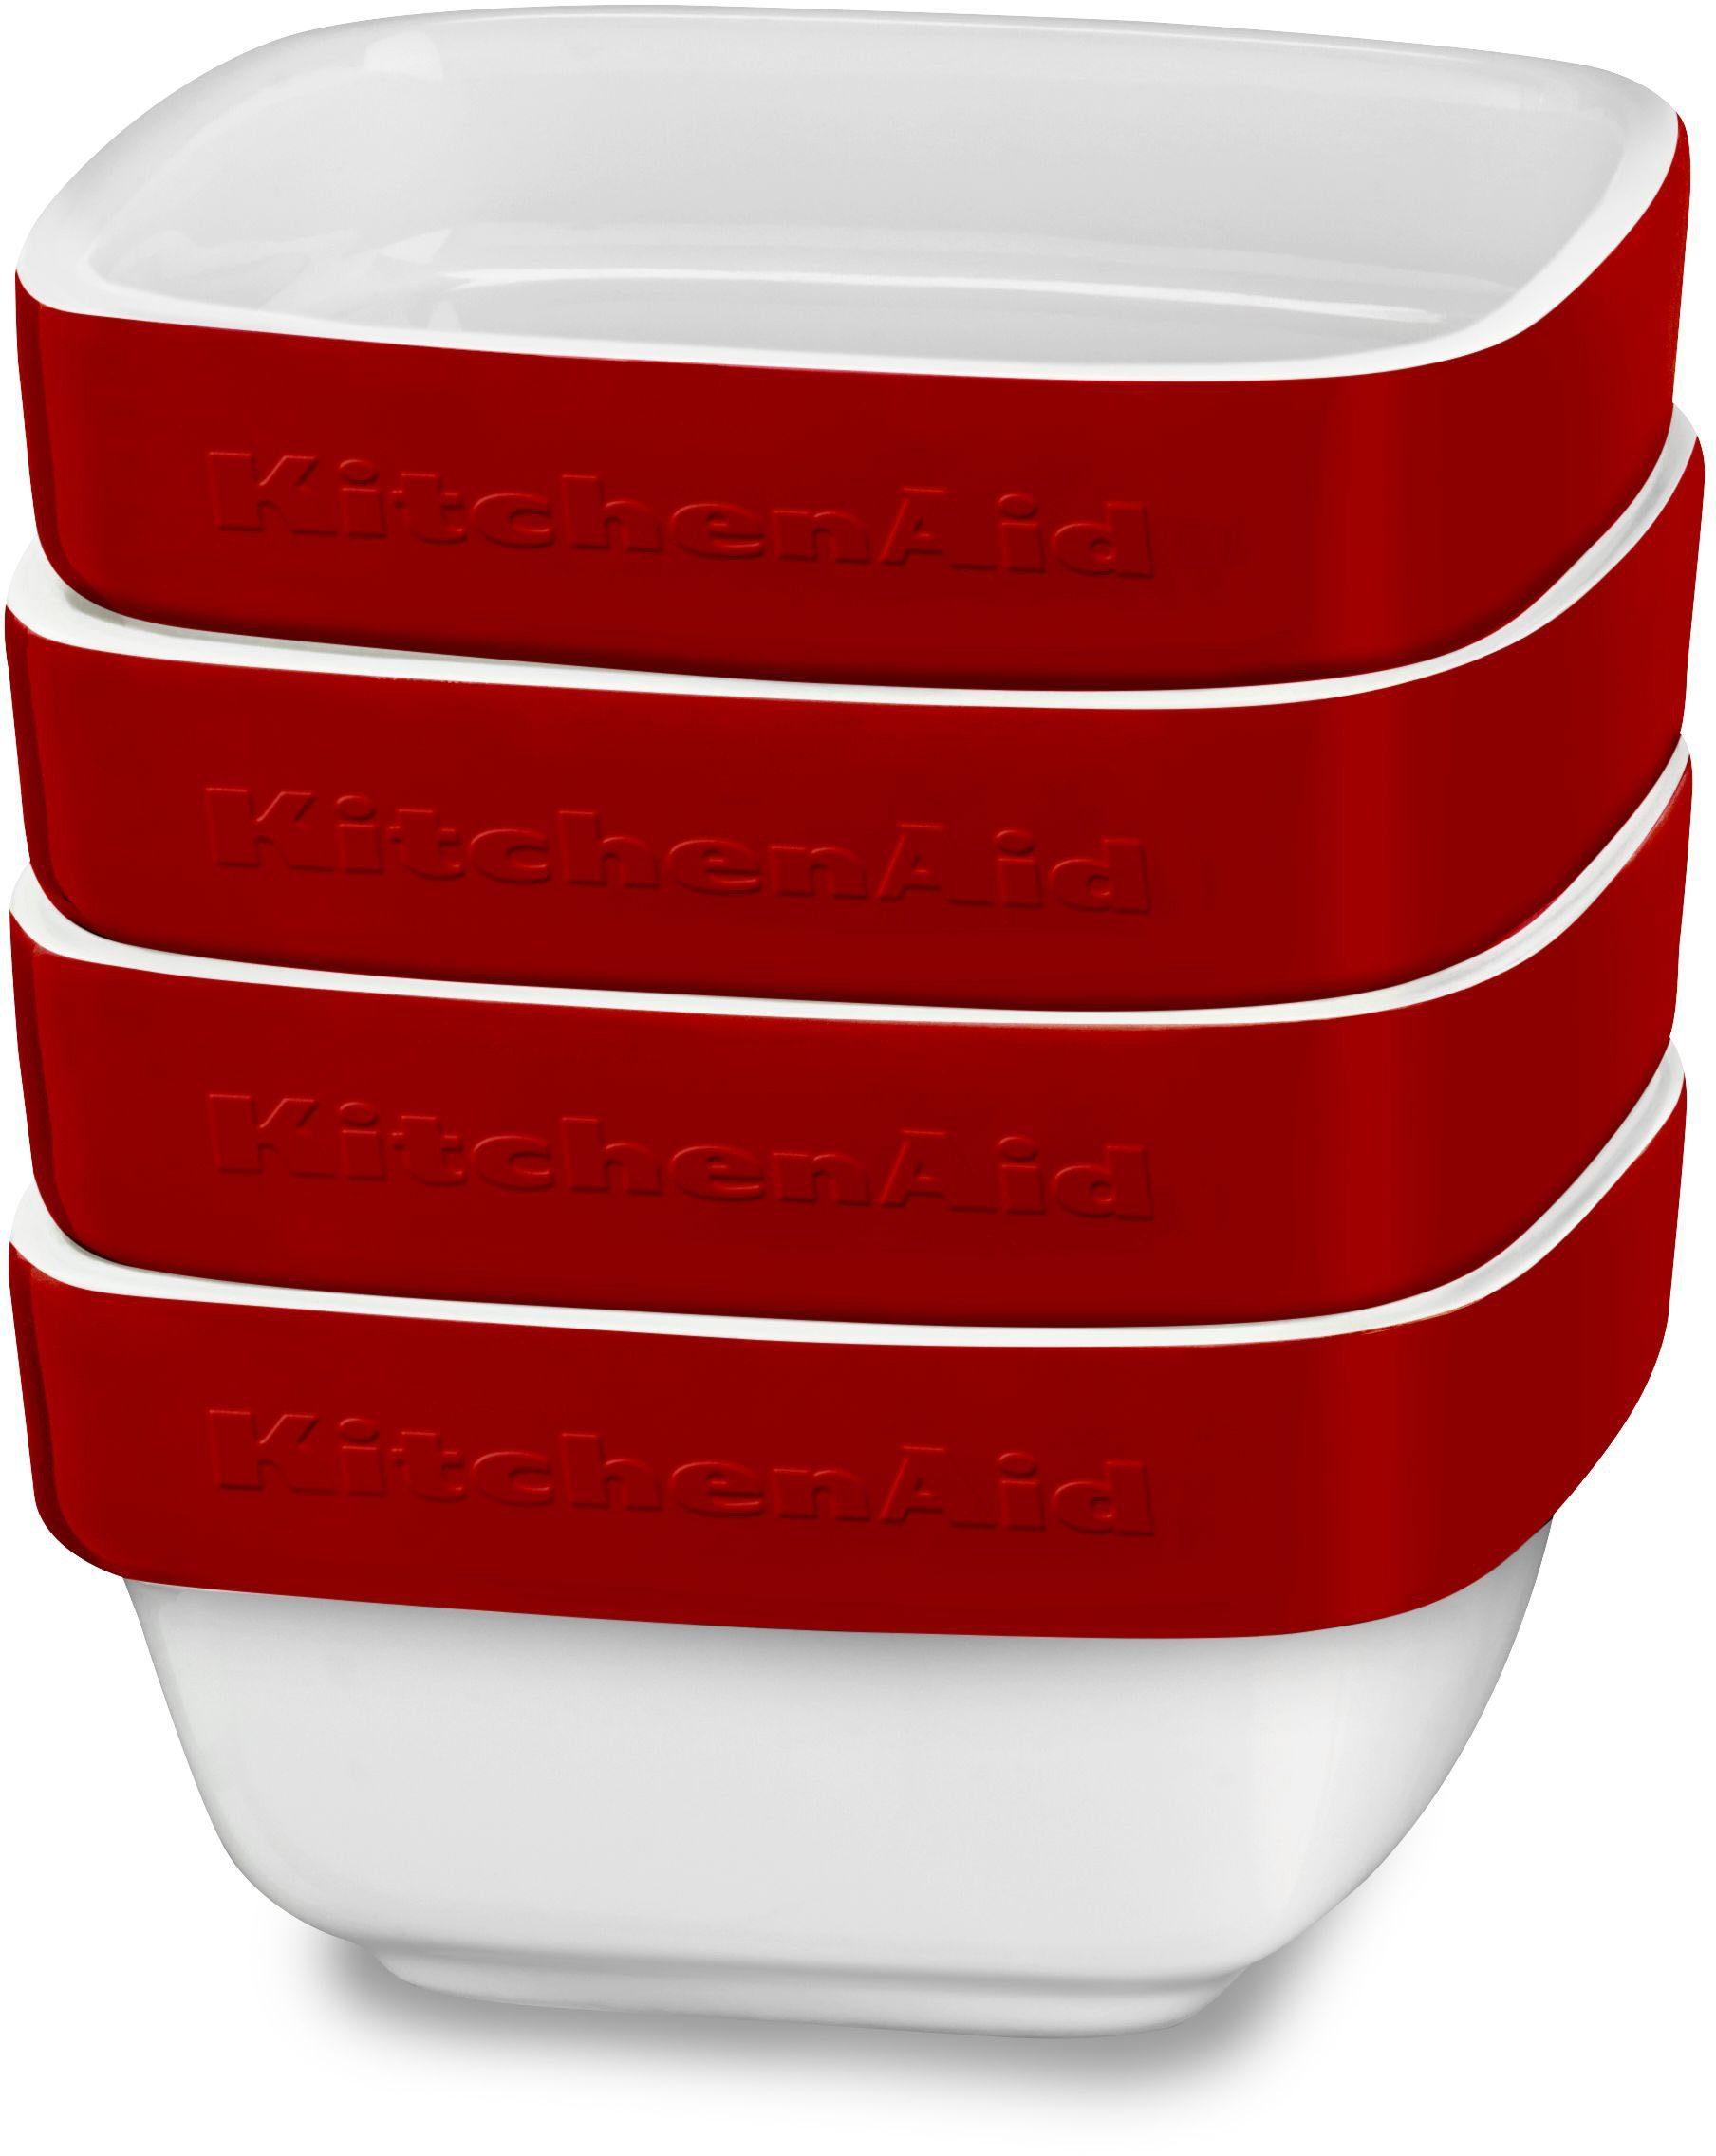 KitchenAid Keramikformen -Set, 4-teilig, »KBLR04RMER«